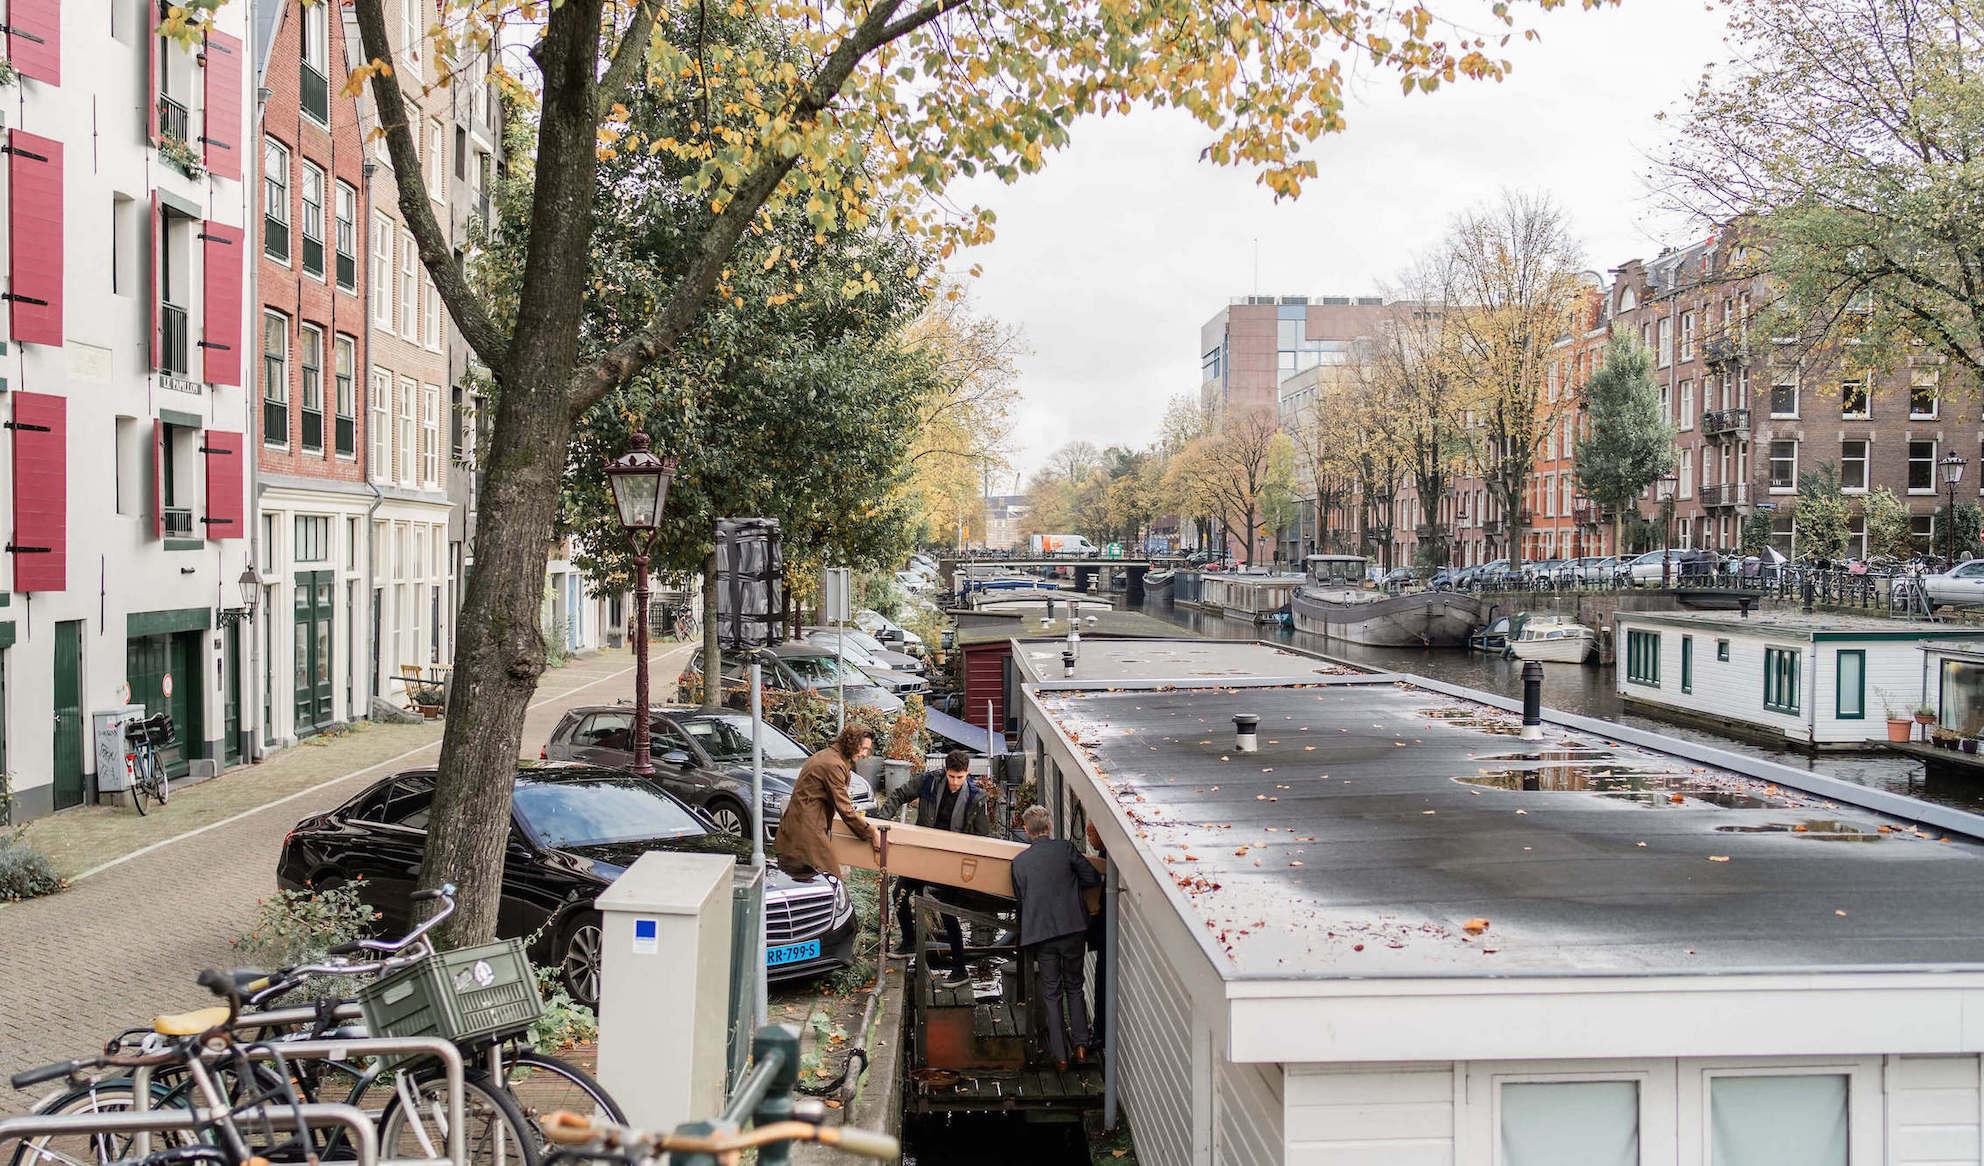 Afscheid salonboot uitvaart Amsterdam